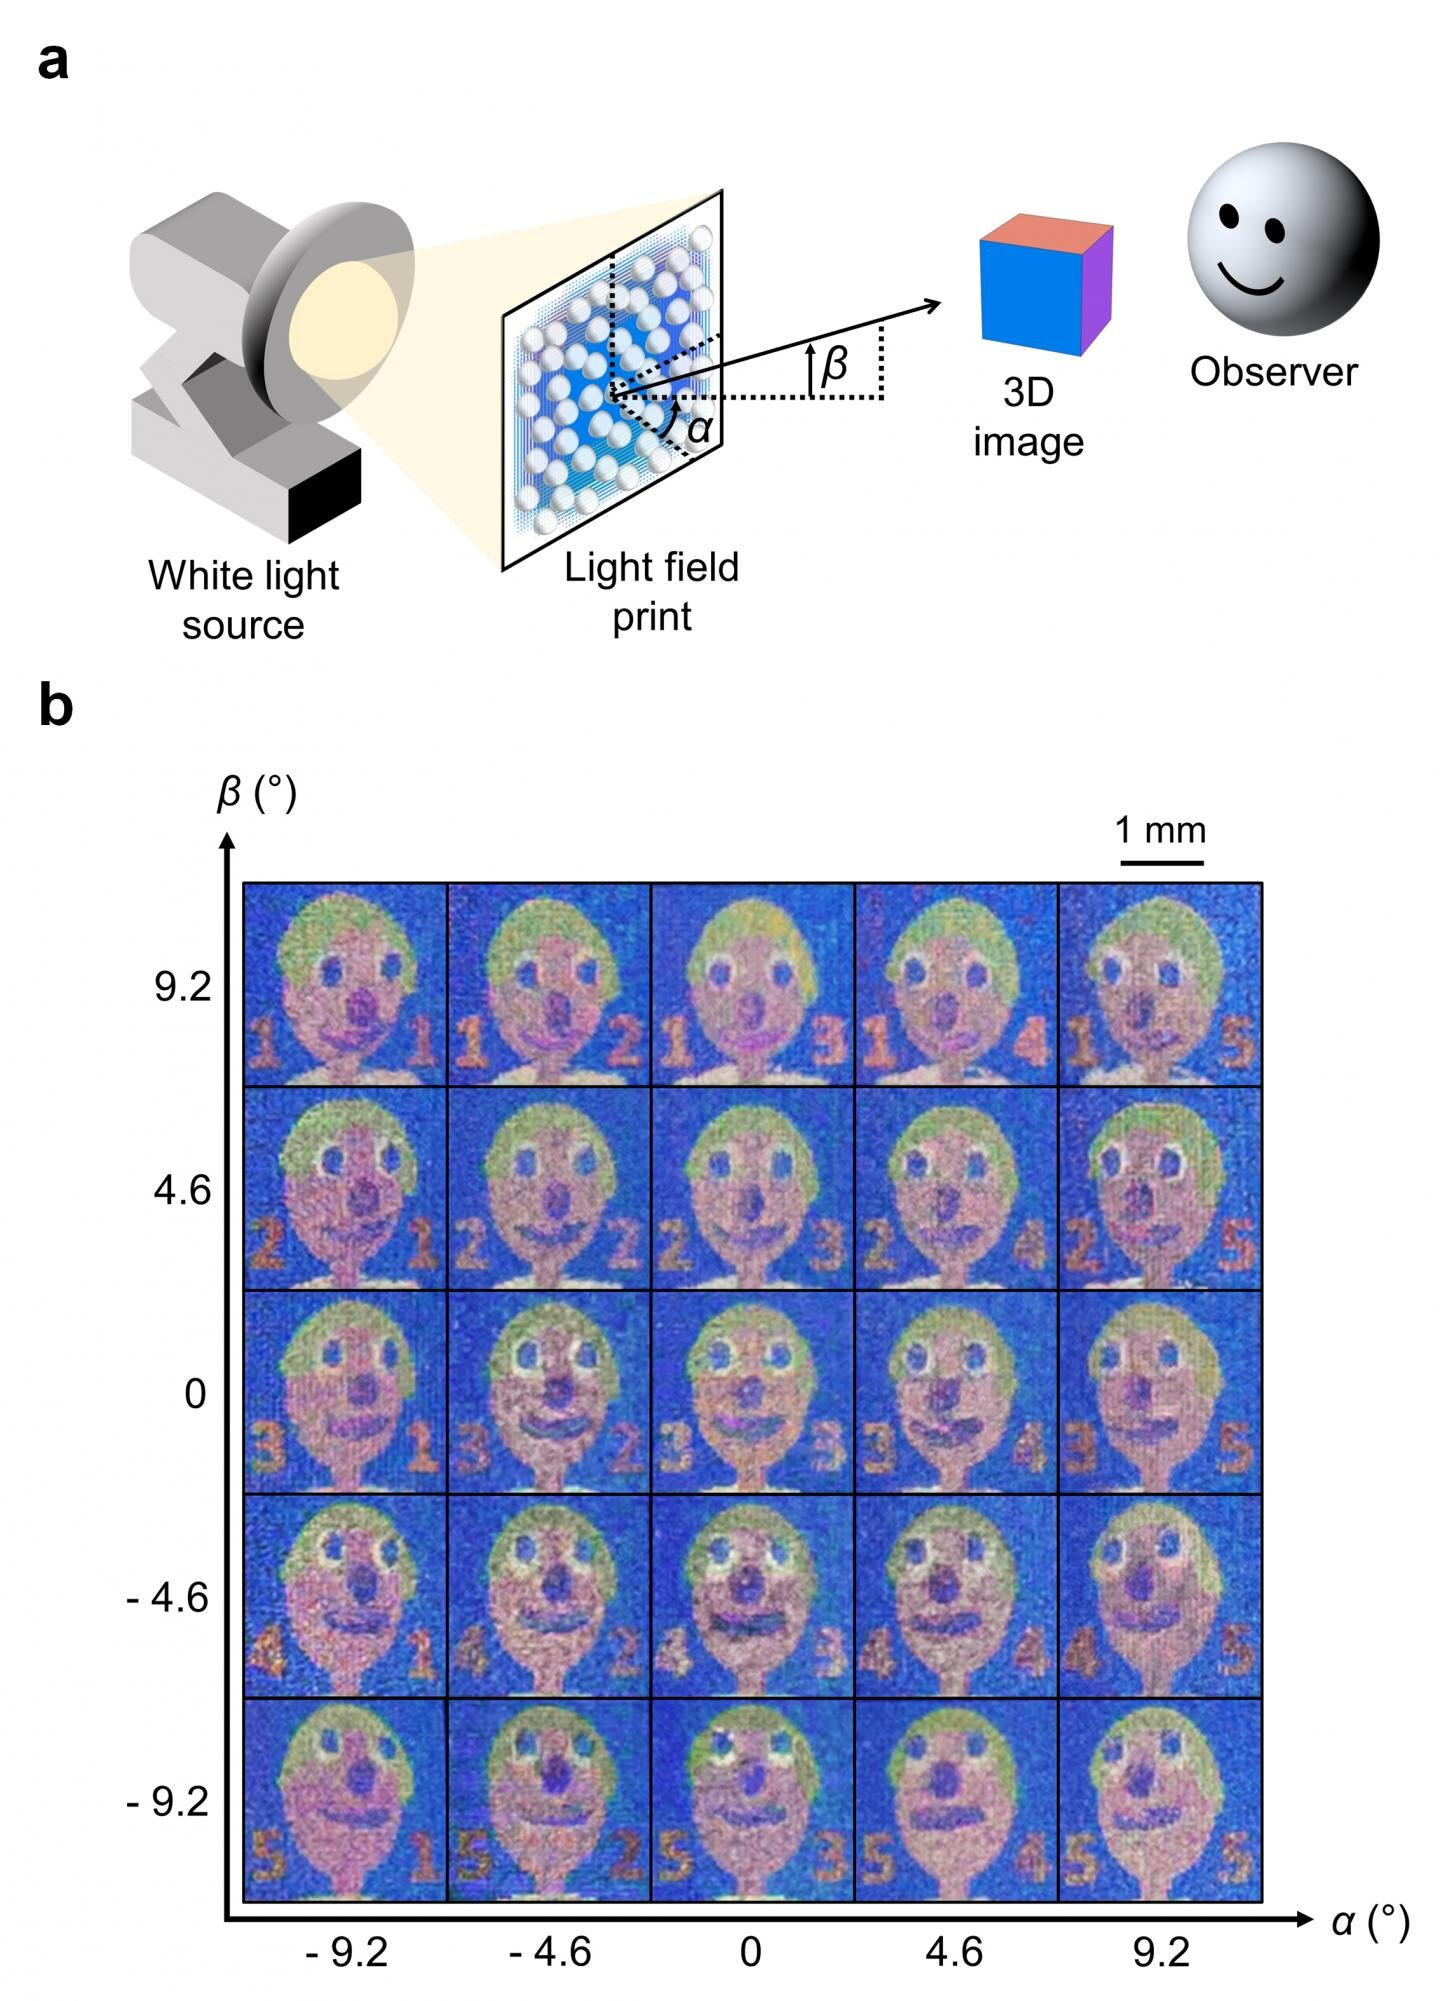 Using nanoscale 3D printing to create high-resolution light field prints